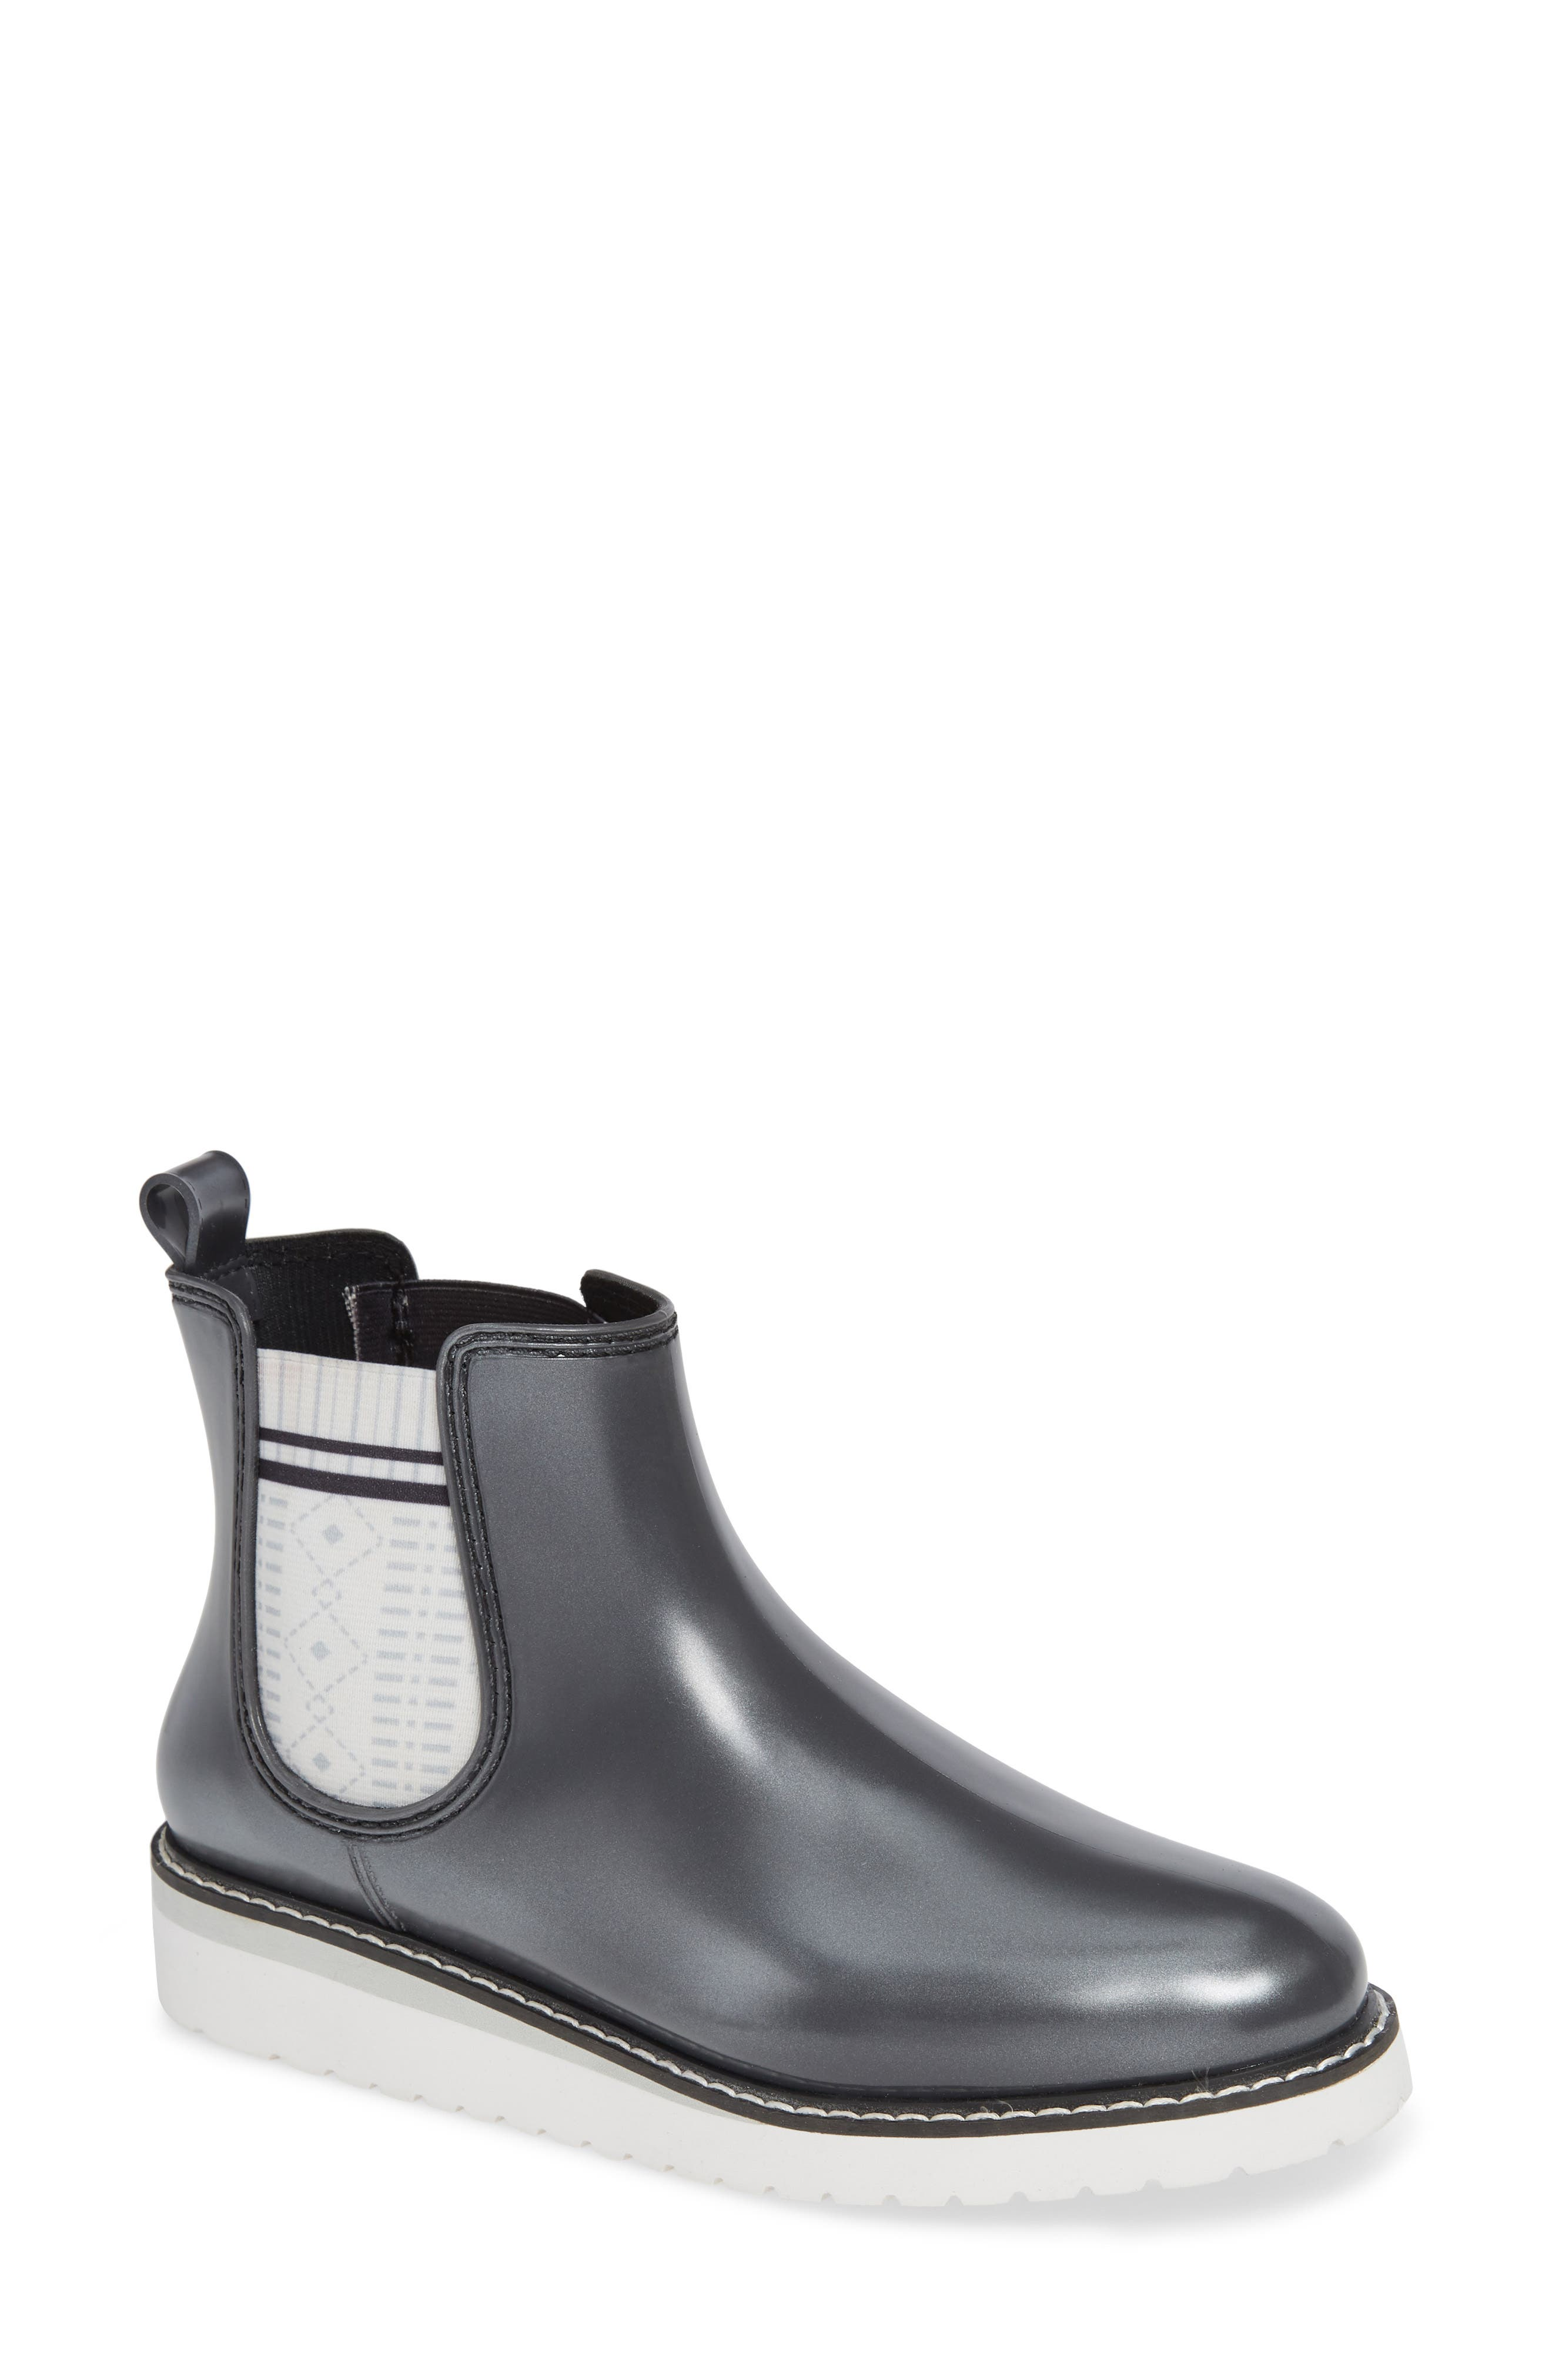 Kensington Chelsea Rain Boot, Main, color, SILVER METALLIC